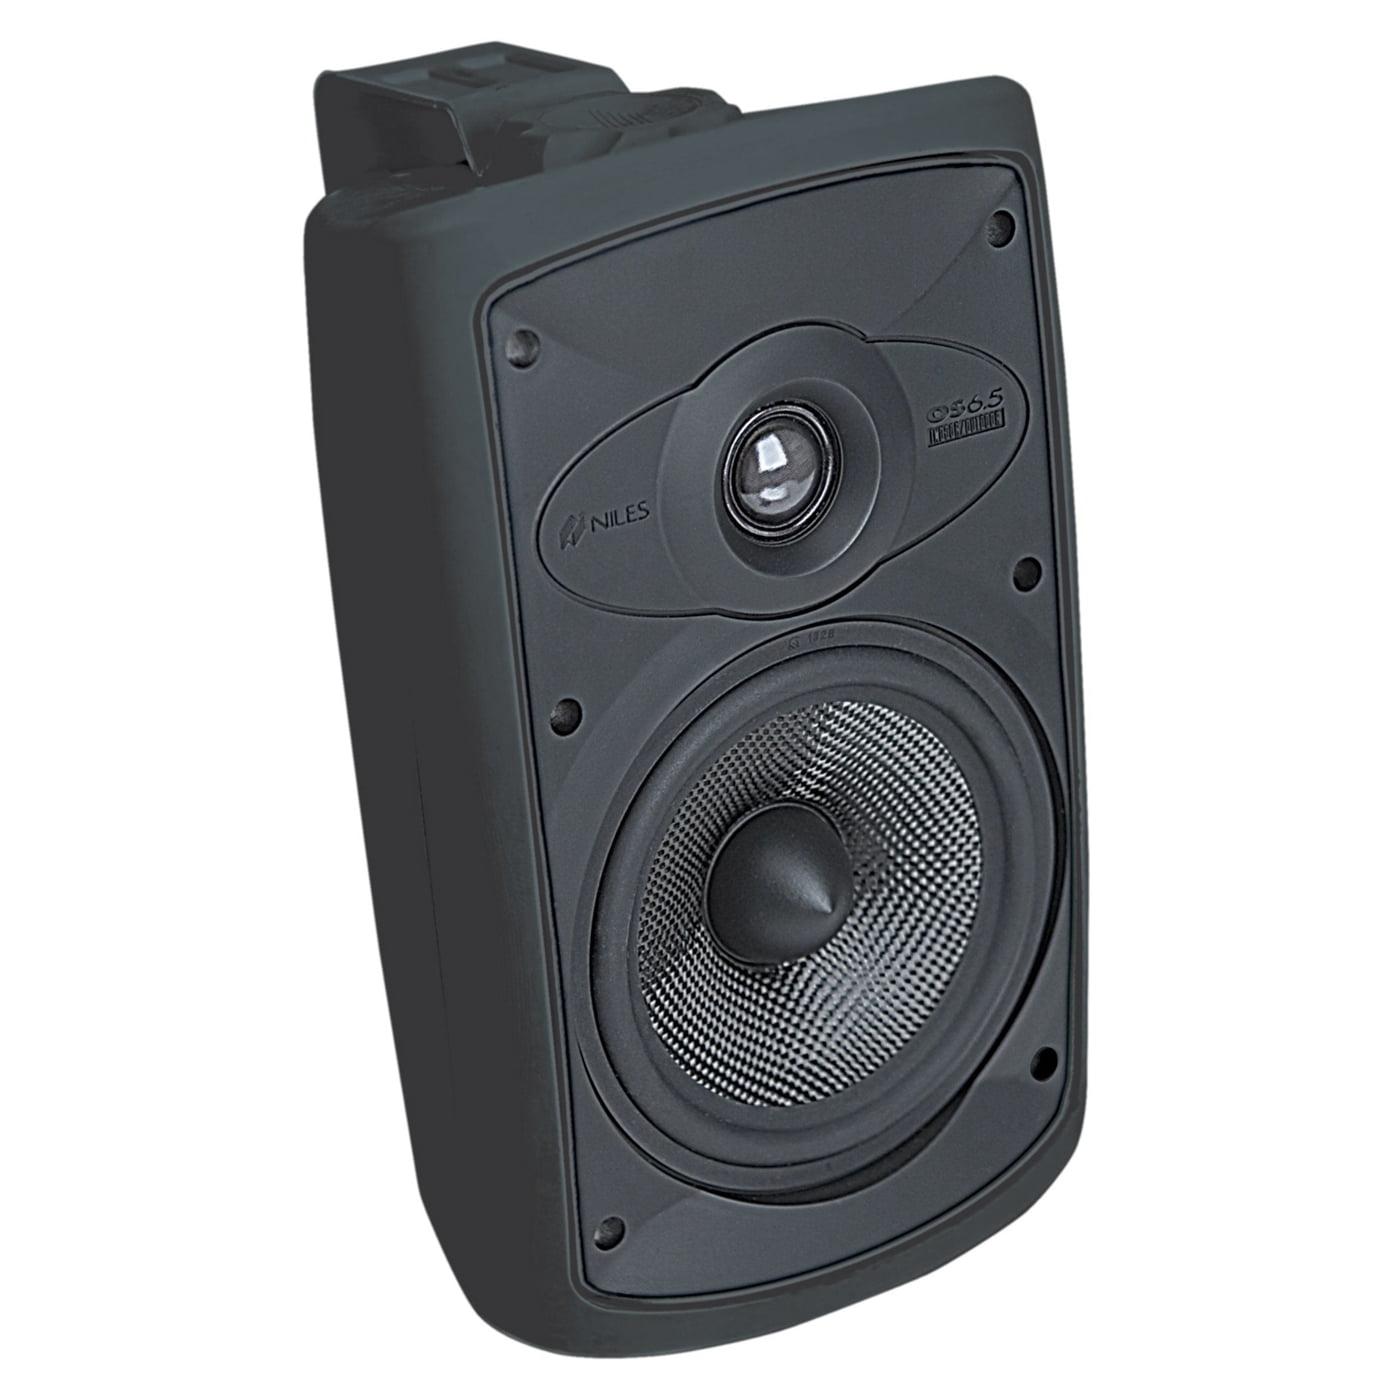 "Niles OS6.5 6"" 2-Way High Performance Indoor/Outdoor Loudspeakers - Pair"